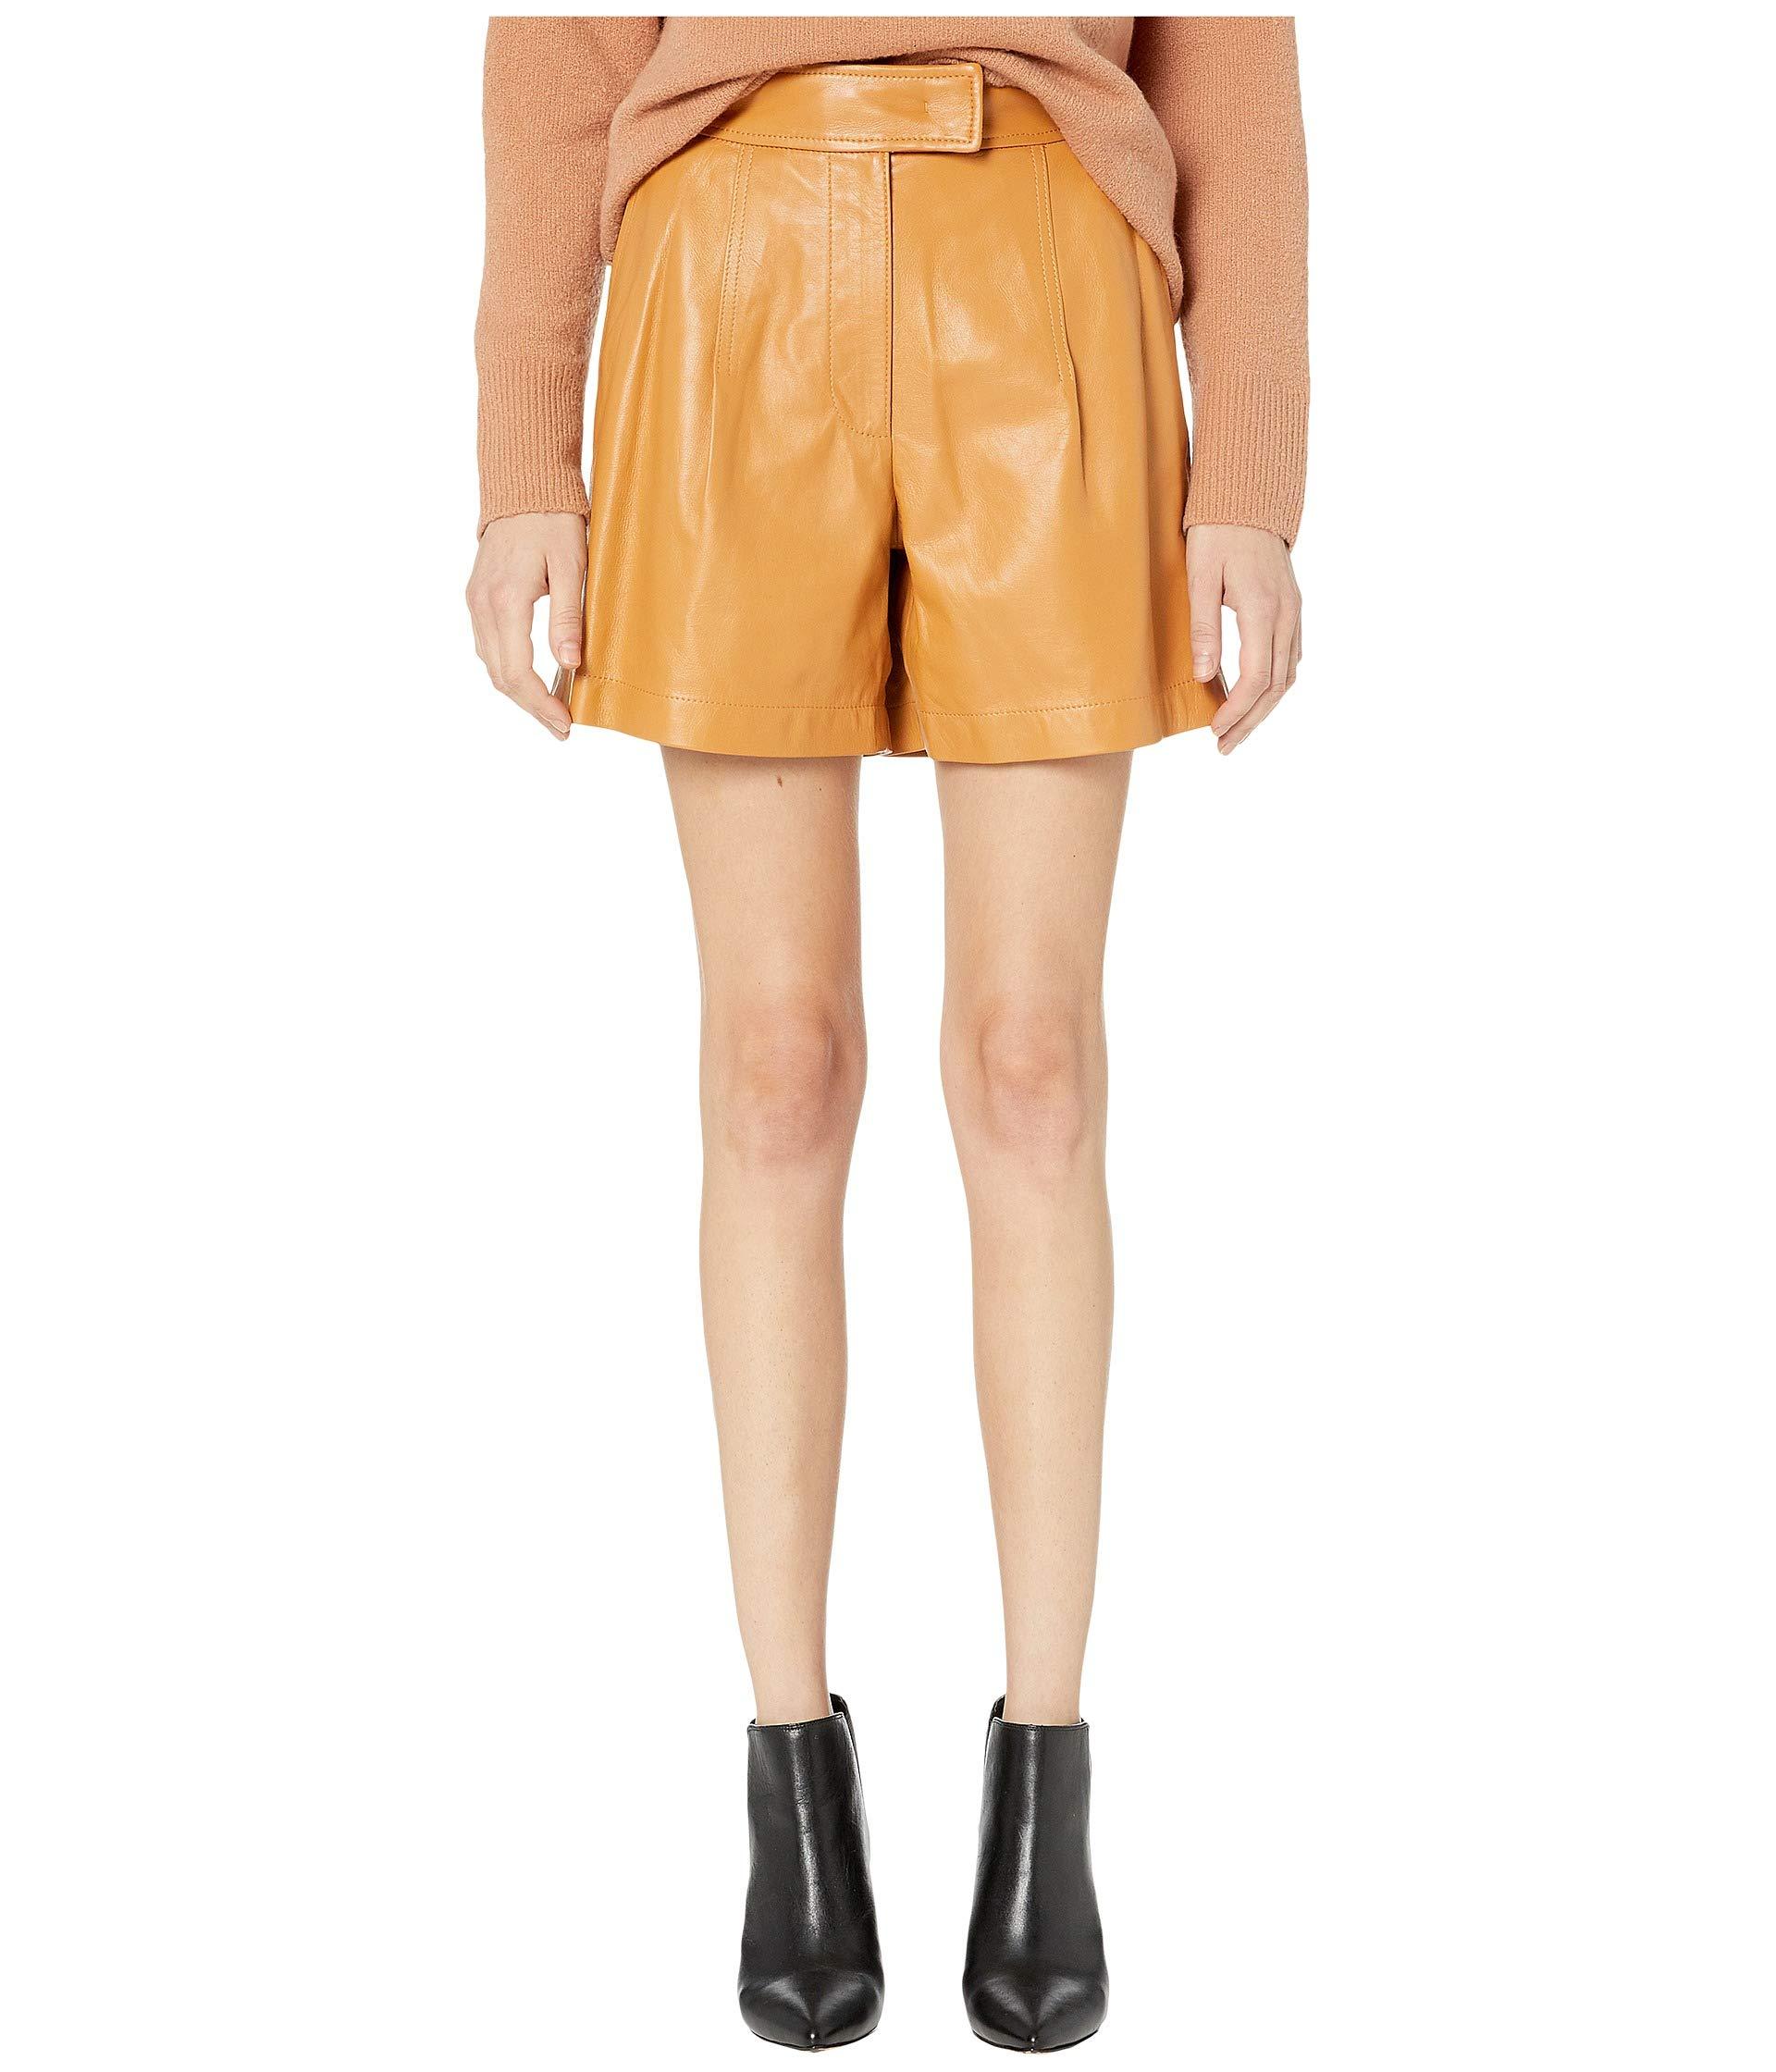 63035156 Sportmax Nepeta Leather Shorts at Luxury.Zappos.com